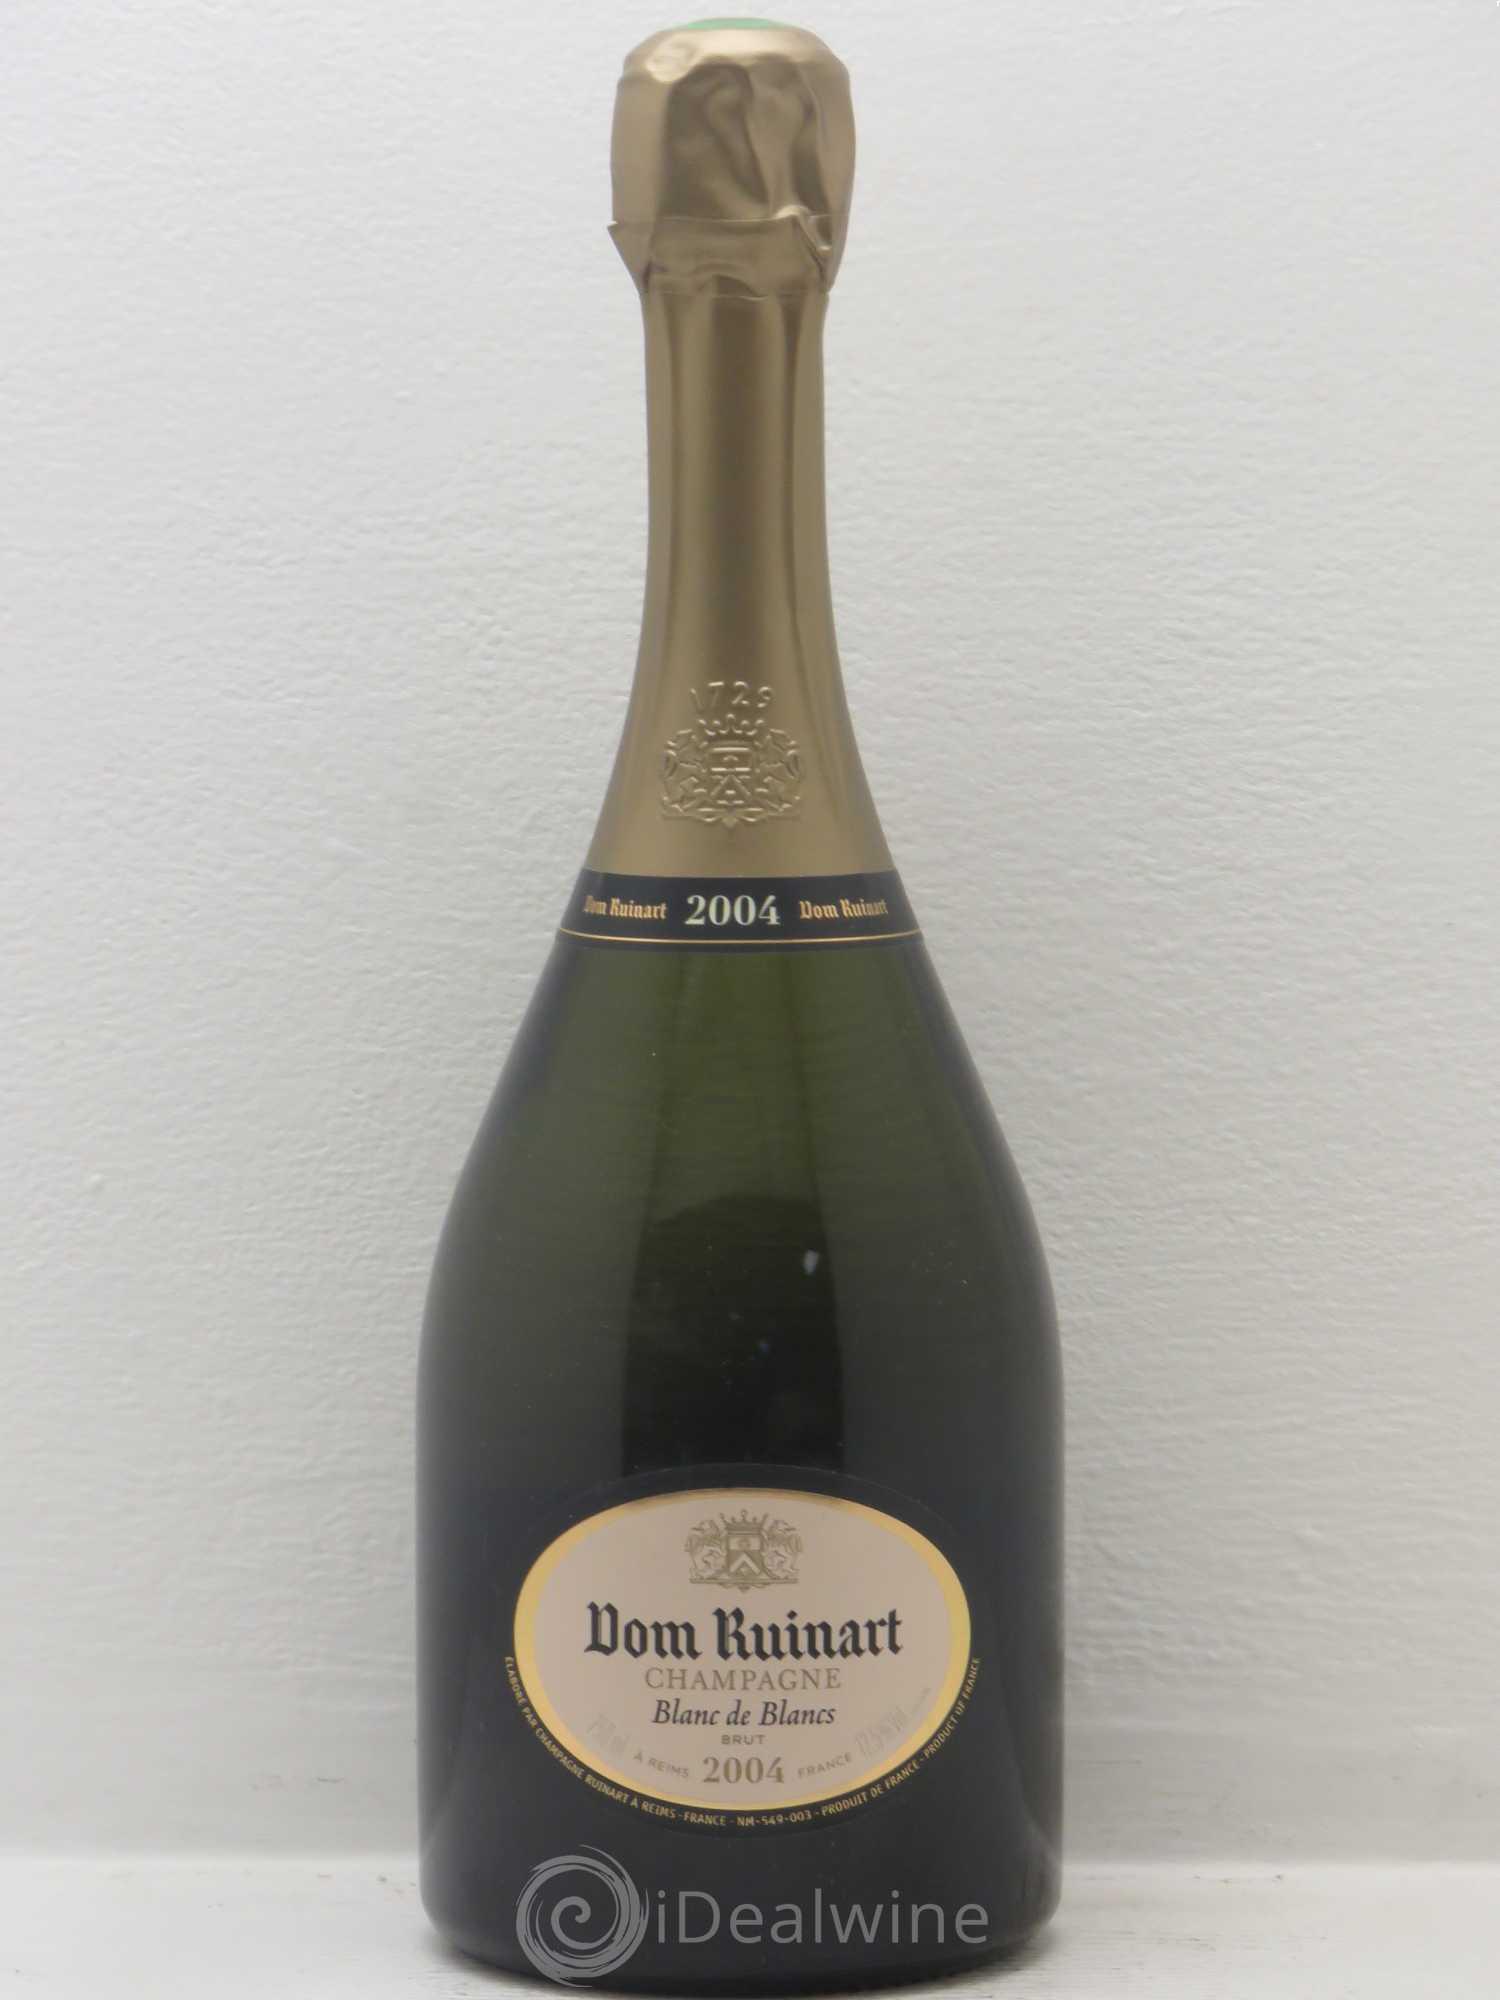 Acheter dom ruinart ruinart blanc de blancs 2004 lot 2054 - Prix champagne ruinart blanc de blanc ...